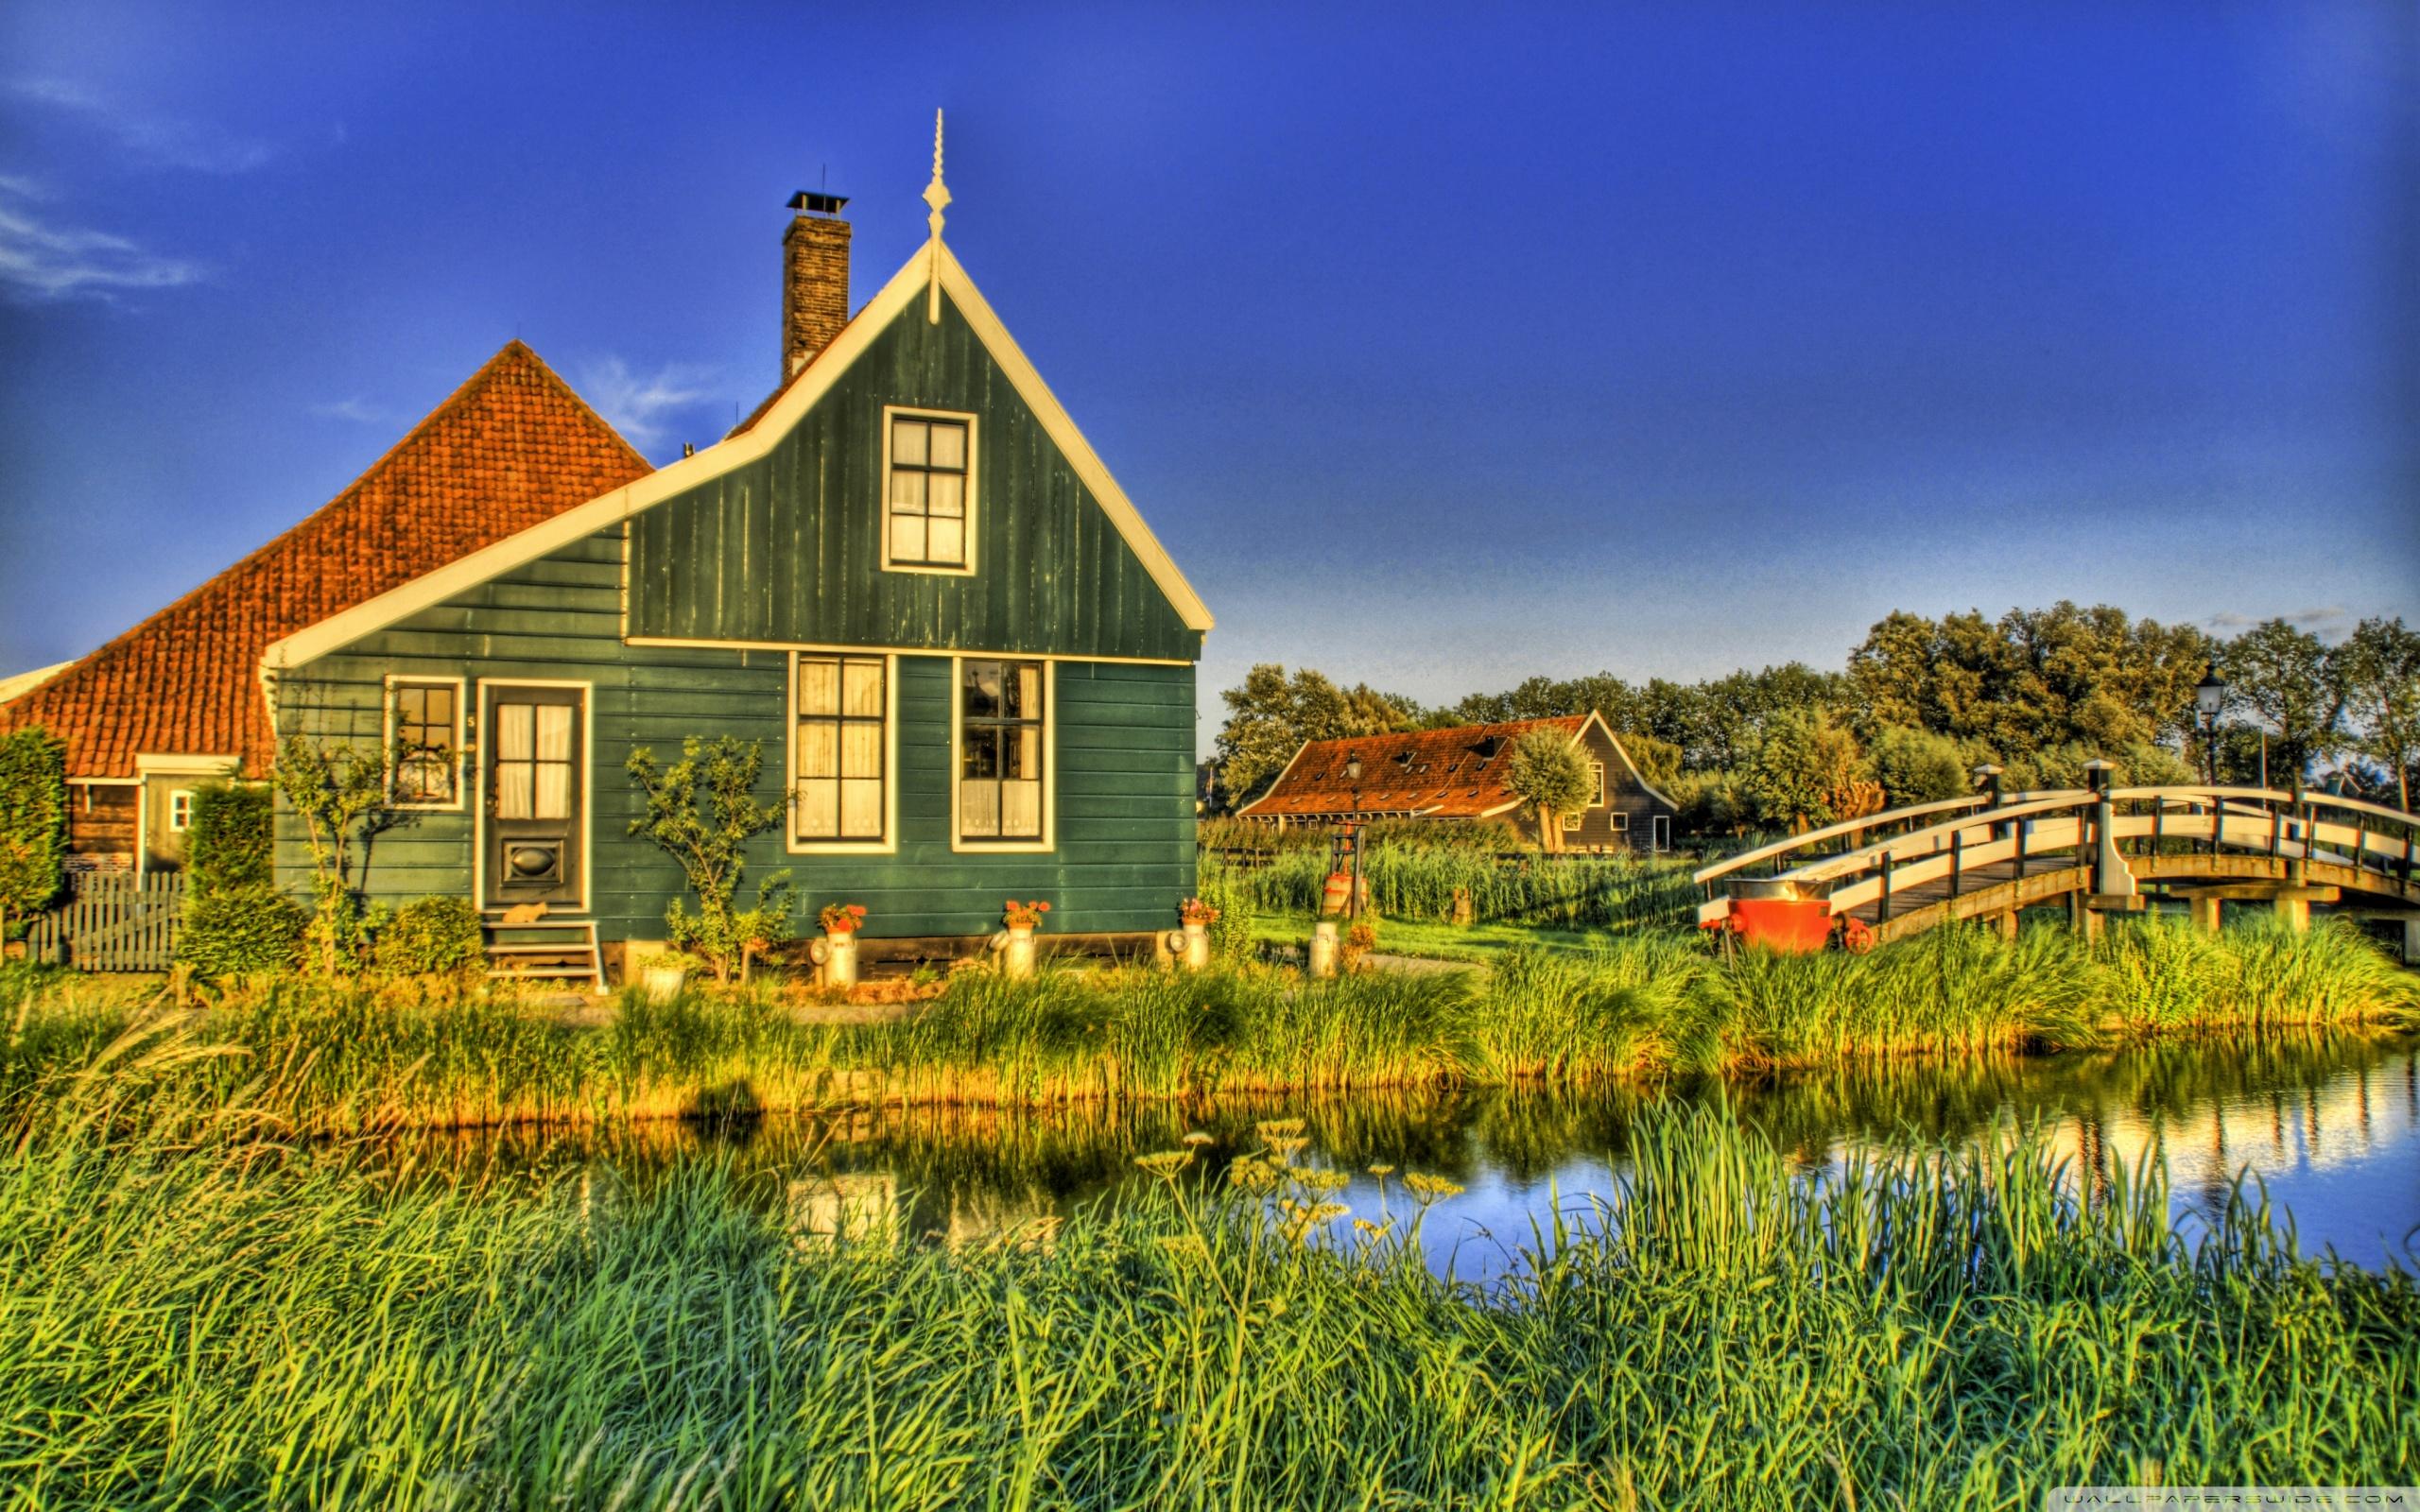 Holland Farmhouse 4K HD Desktop Wallpaper for 4K Ultra HD TV 2560x1600